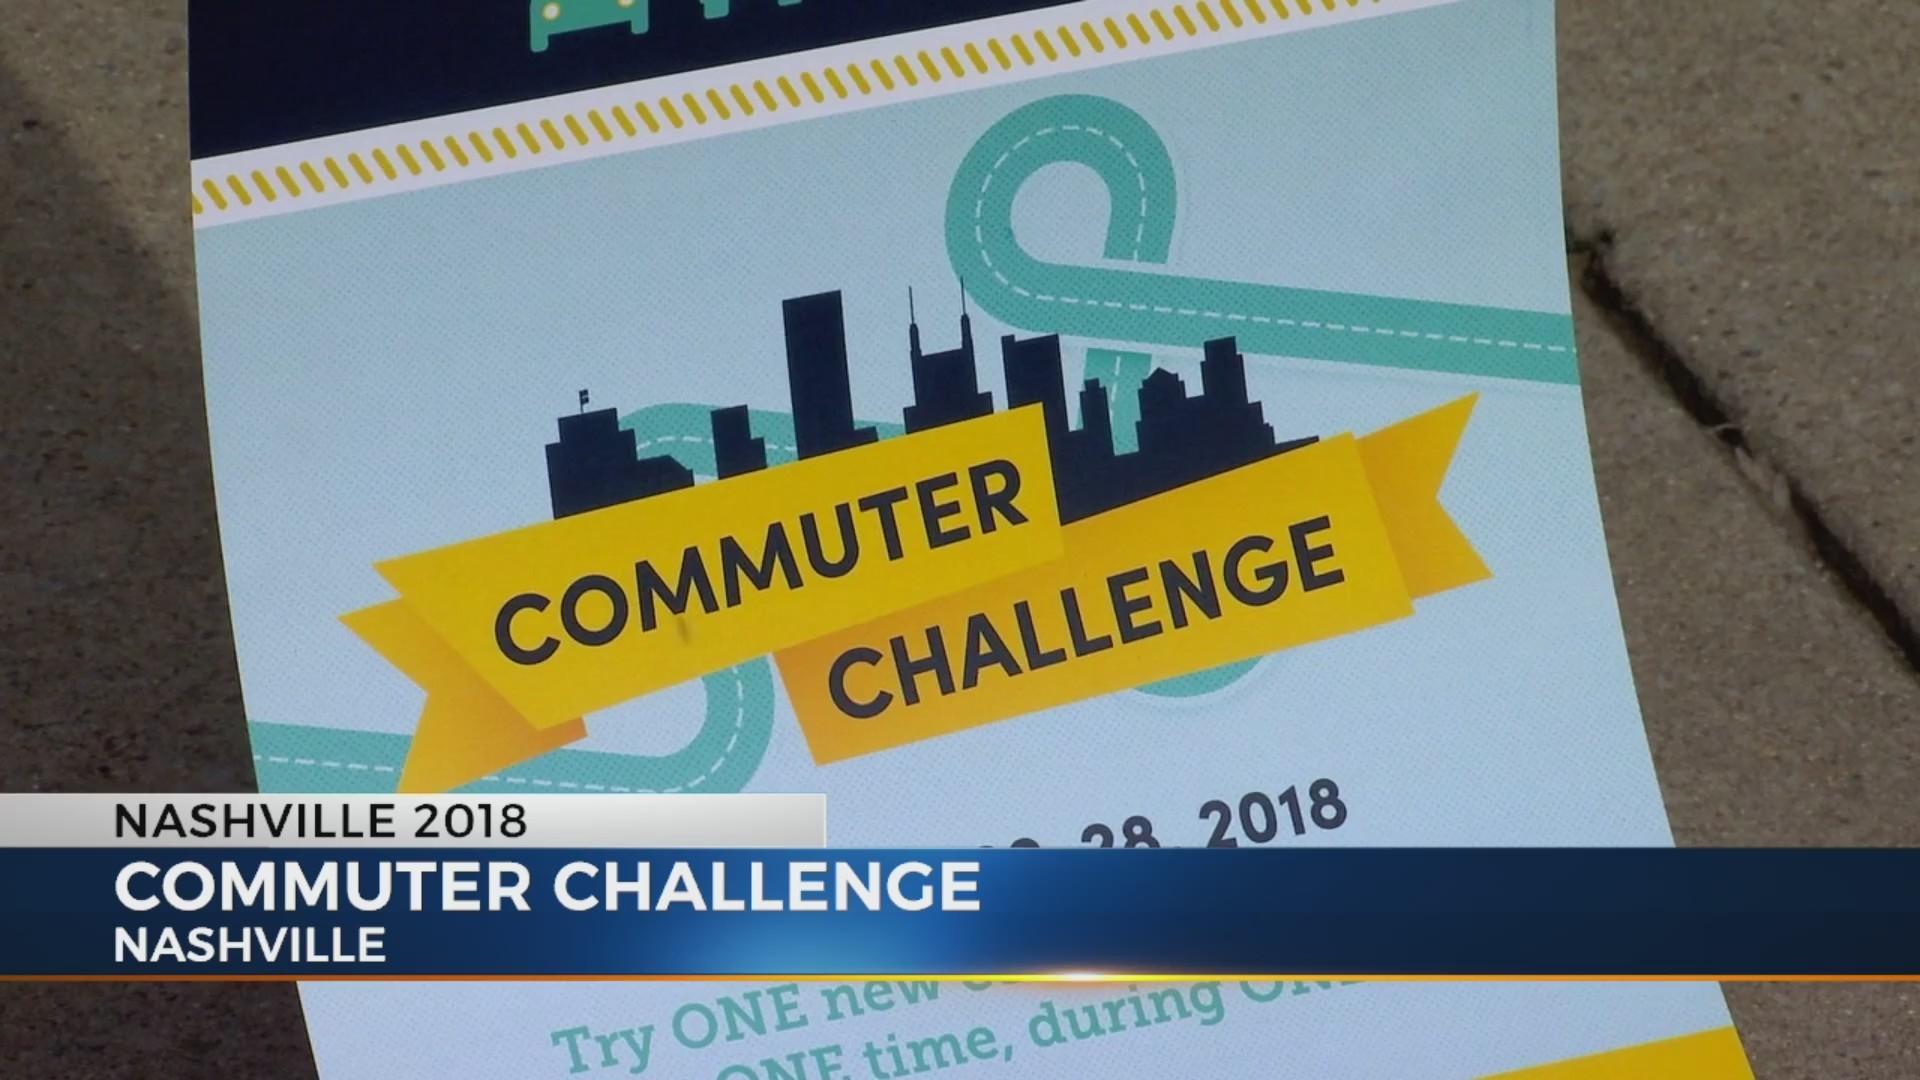 Nashville_Commuter_Challenge_aims_to_get_0_20181022222558